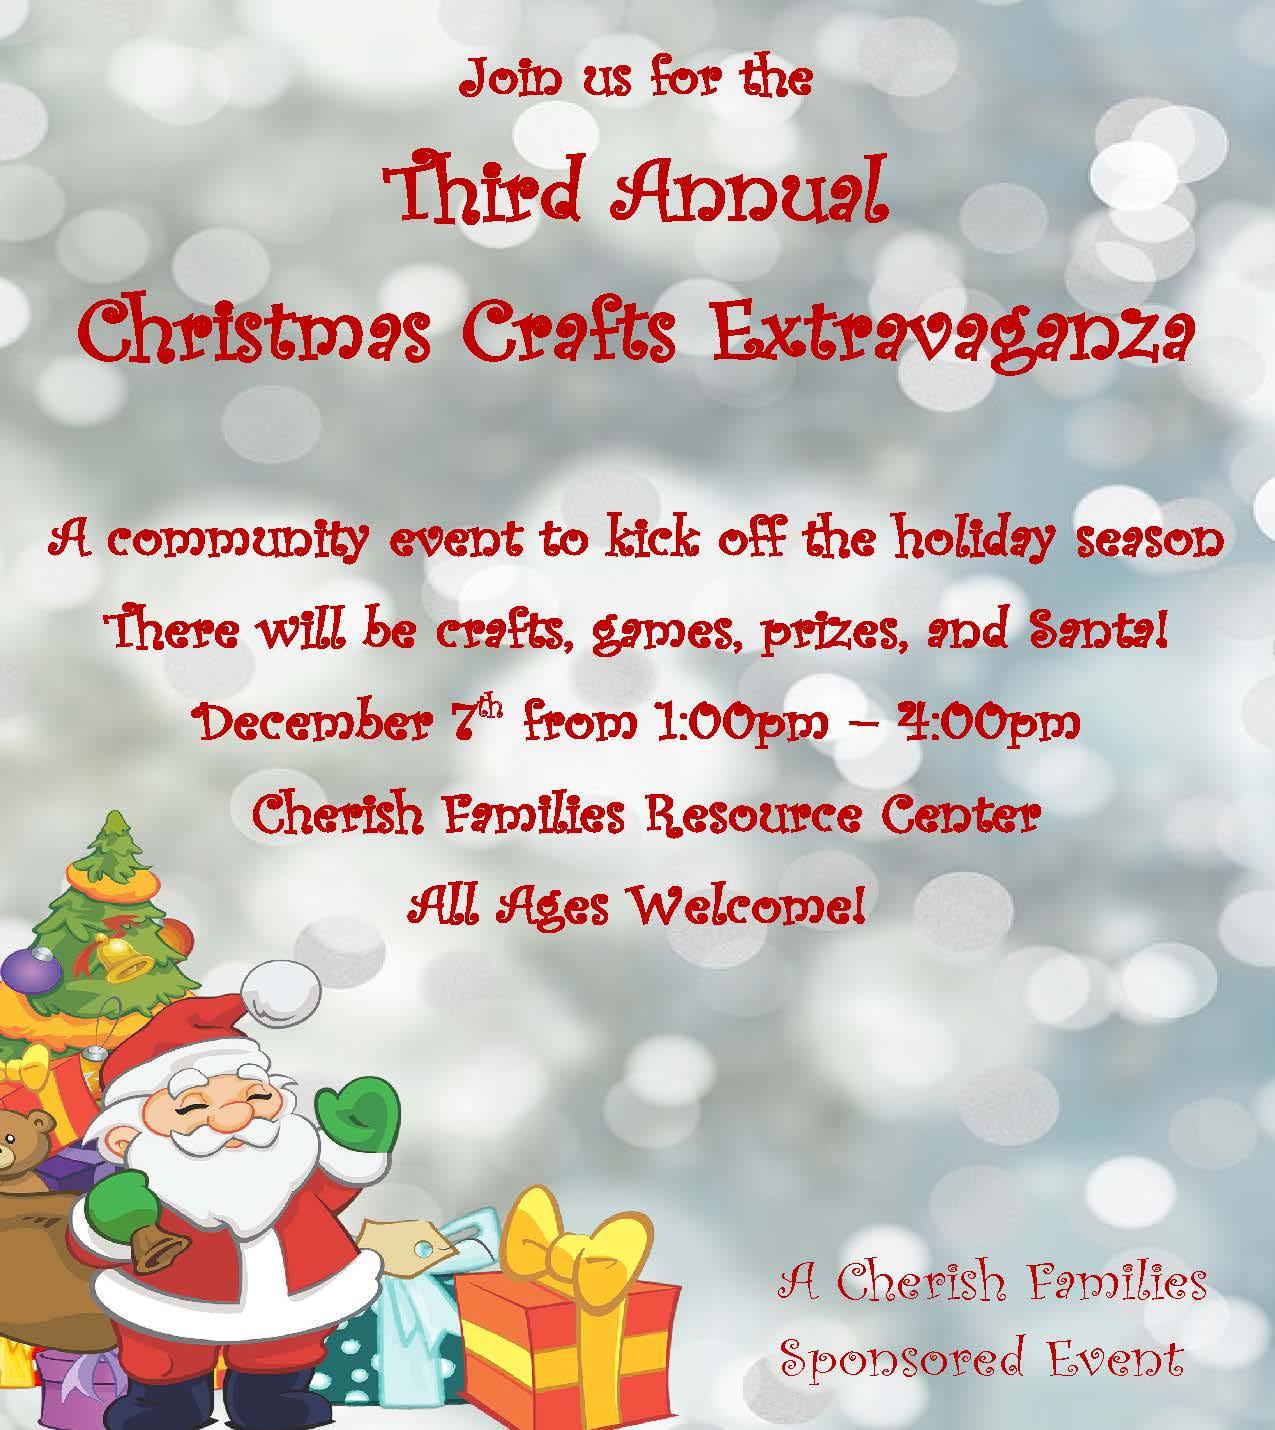 Third Annual Christmas Crafts Extravaganza